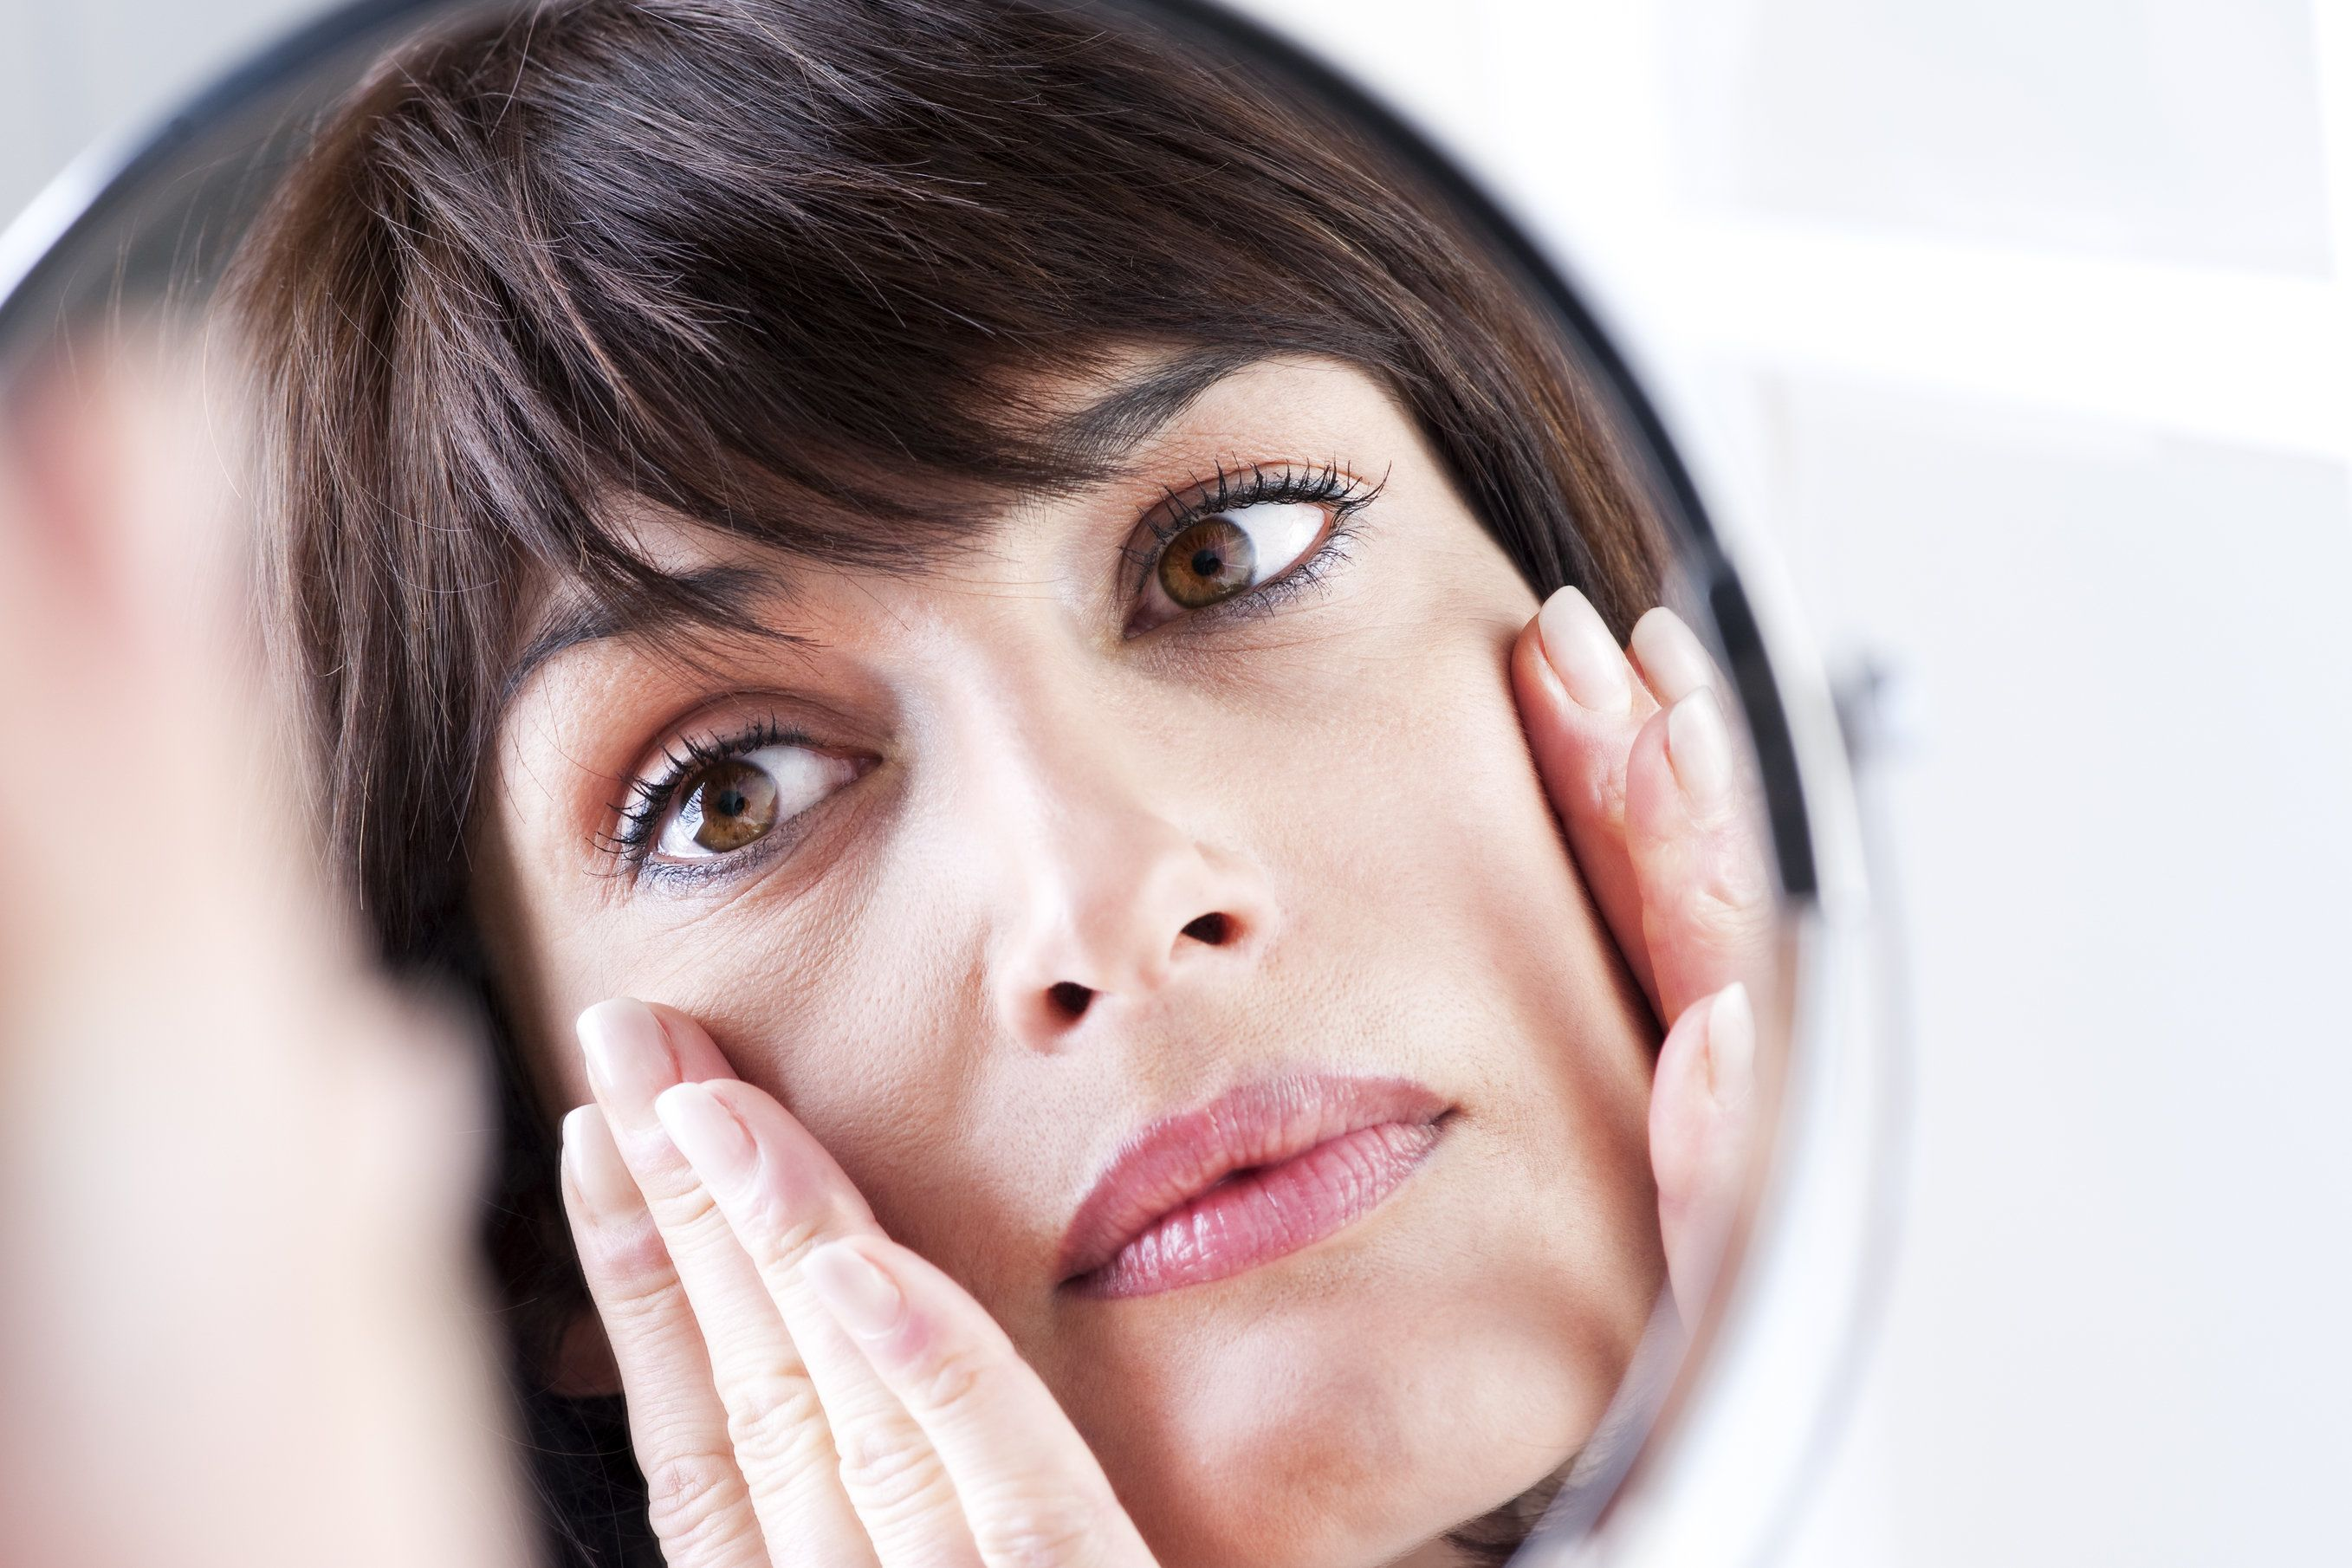 A woman's visage